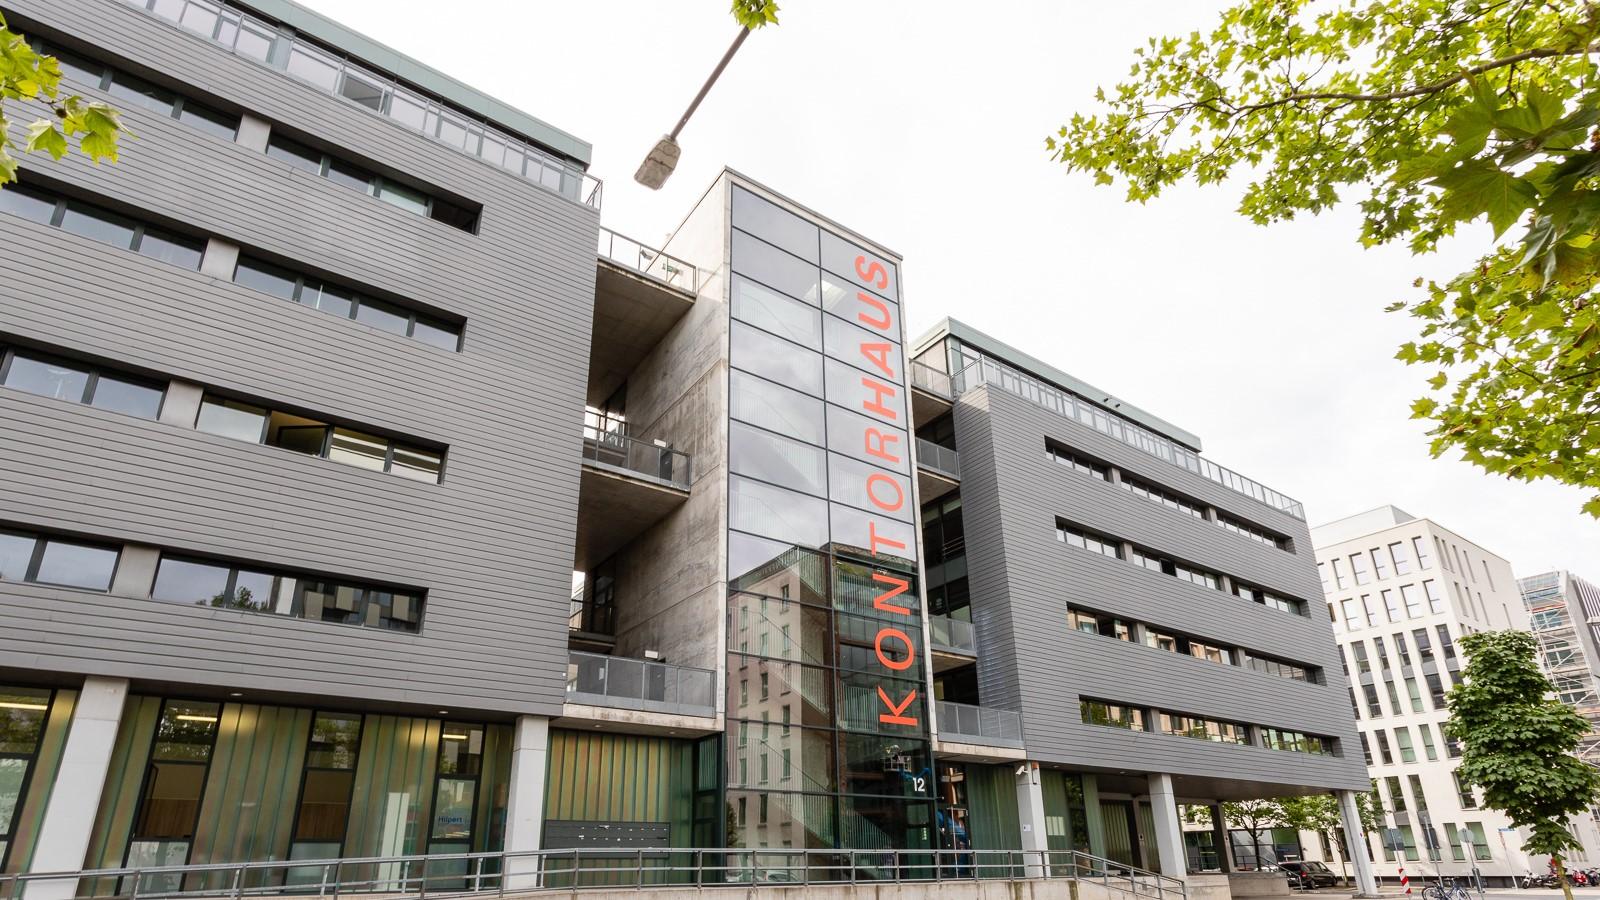 Kontorhaus Aussen